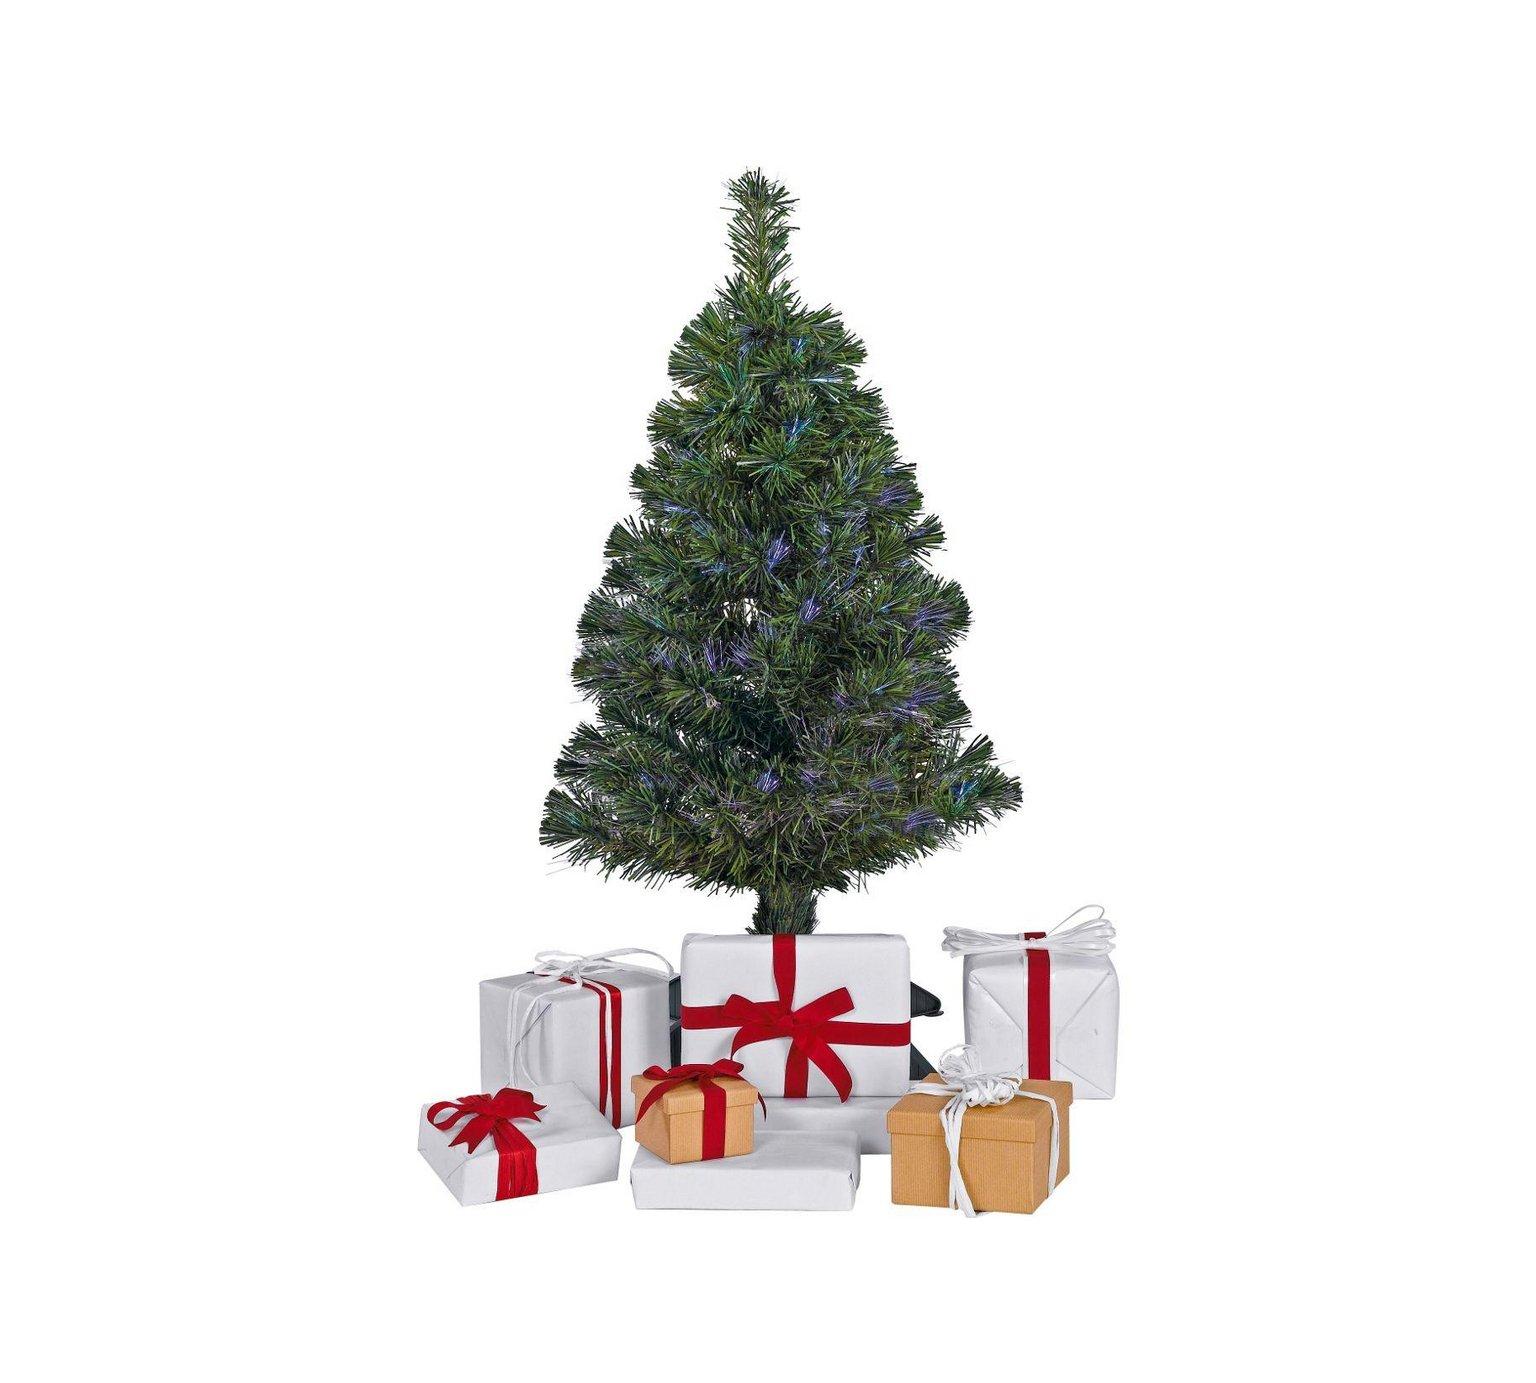 Mini Christmas Tree - 3ft Mini Fibre Optic Christmas Tree - Green for £4.99 @Argos